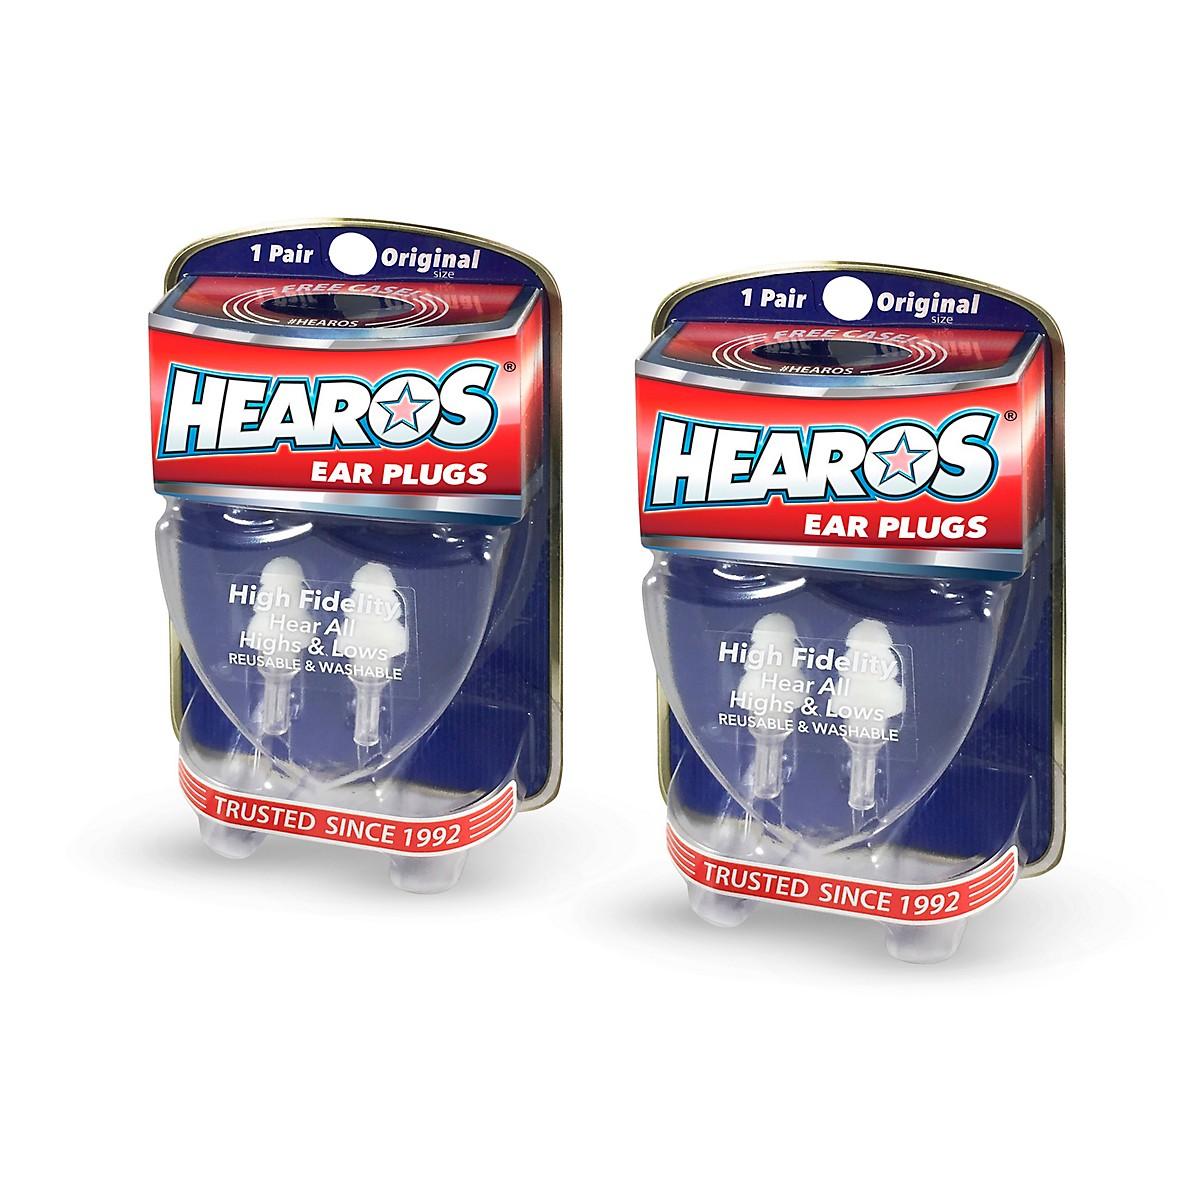 Hearos High Fidelity Ear Plugs 2-Pack